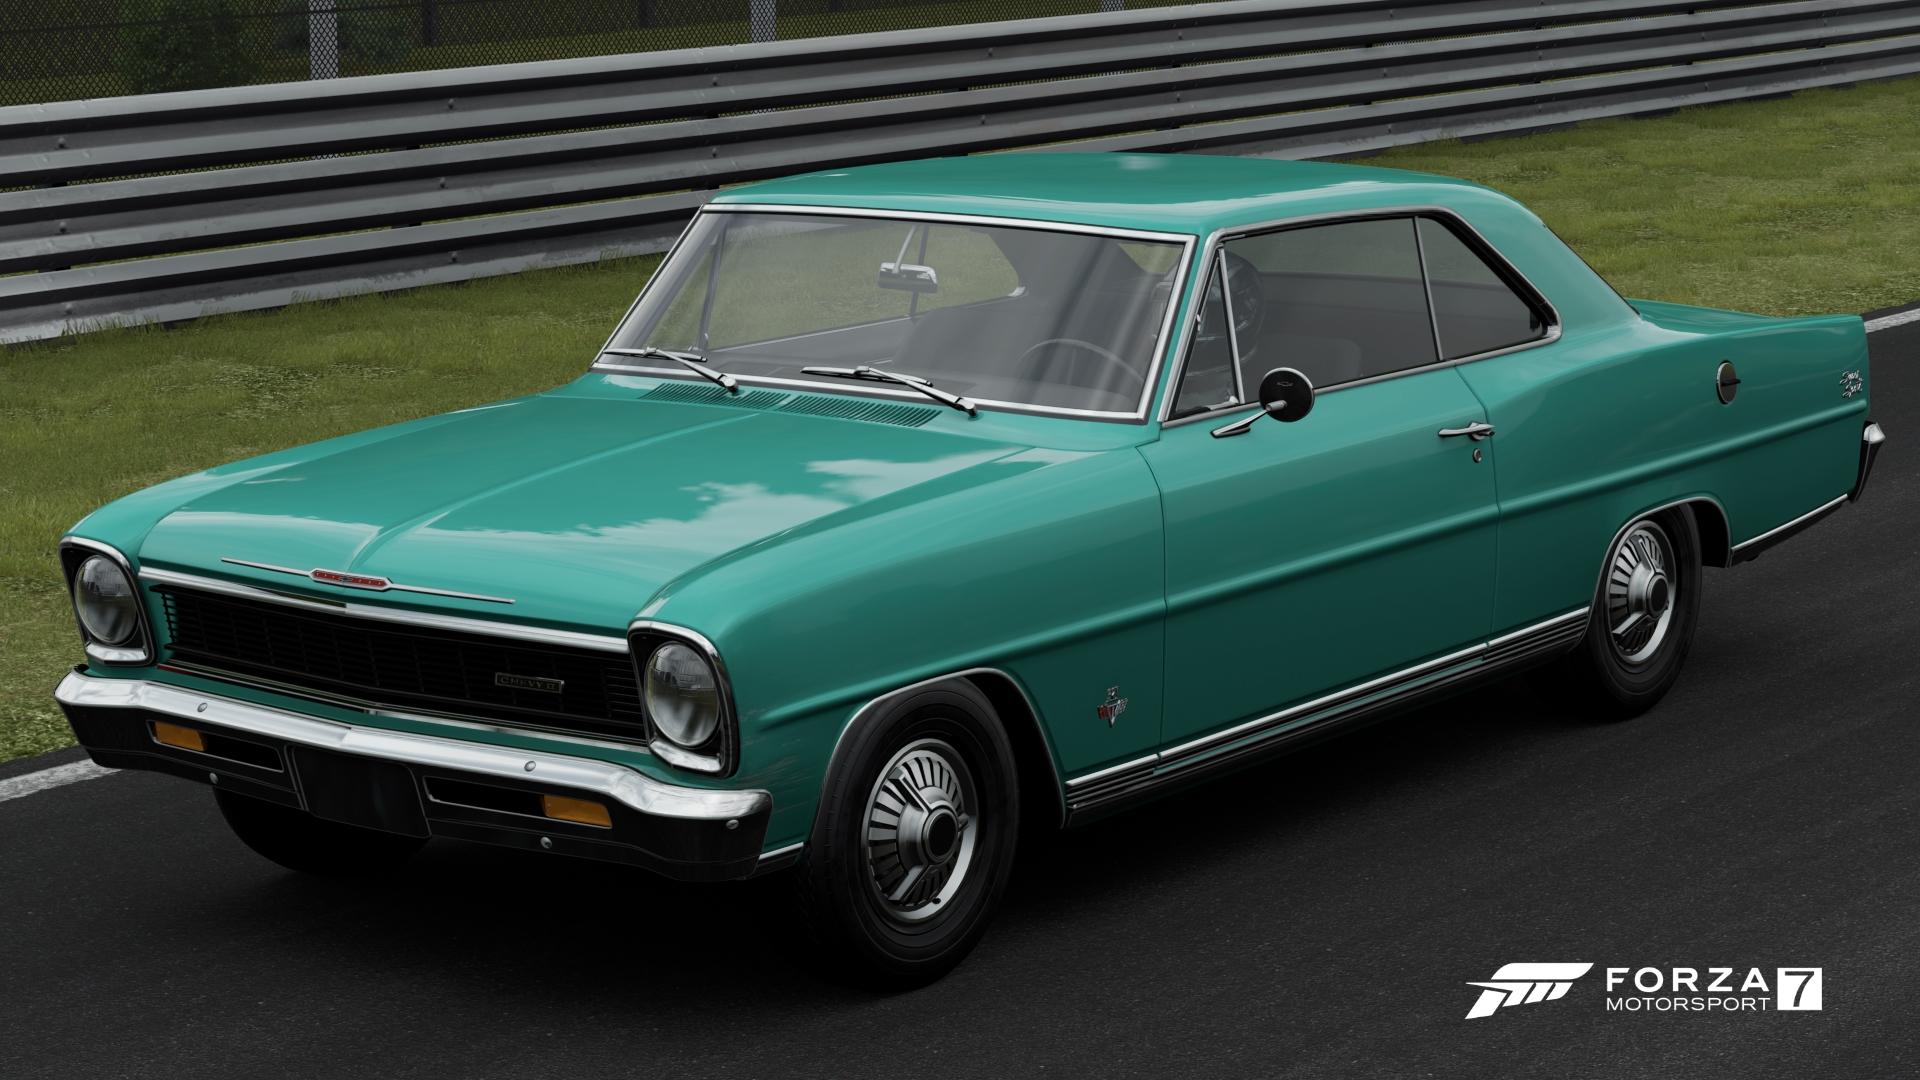 Chevrolet Nova Super Sport Forza Motorsport Wiki Fandom